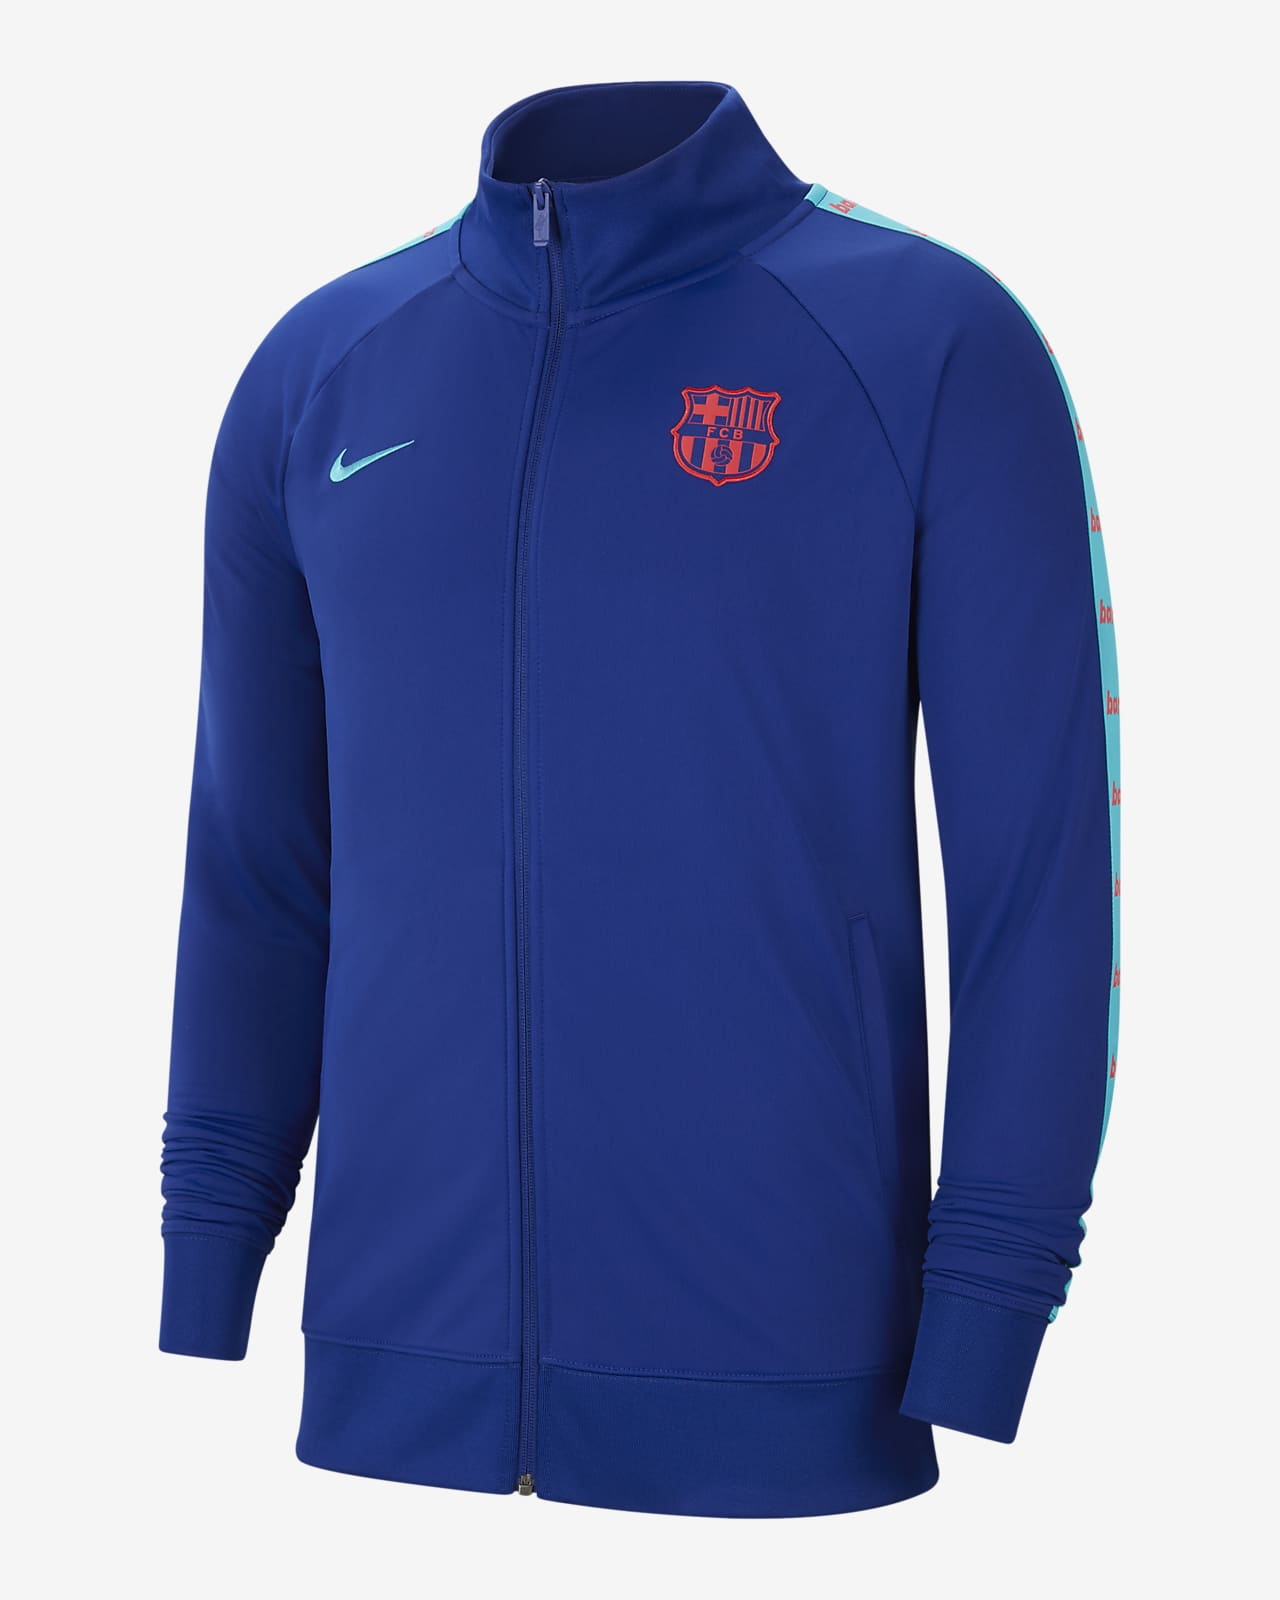 F.C. Barcelona JDI Men's Jacket